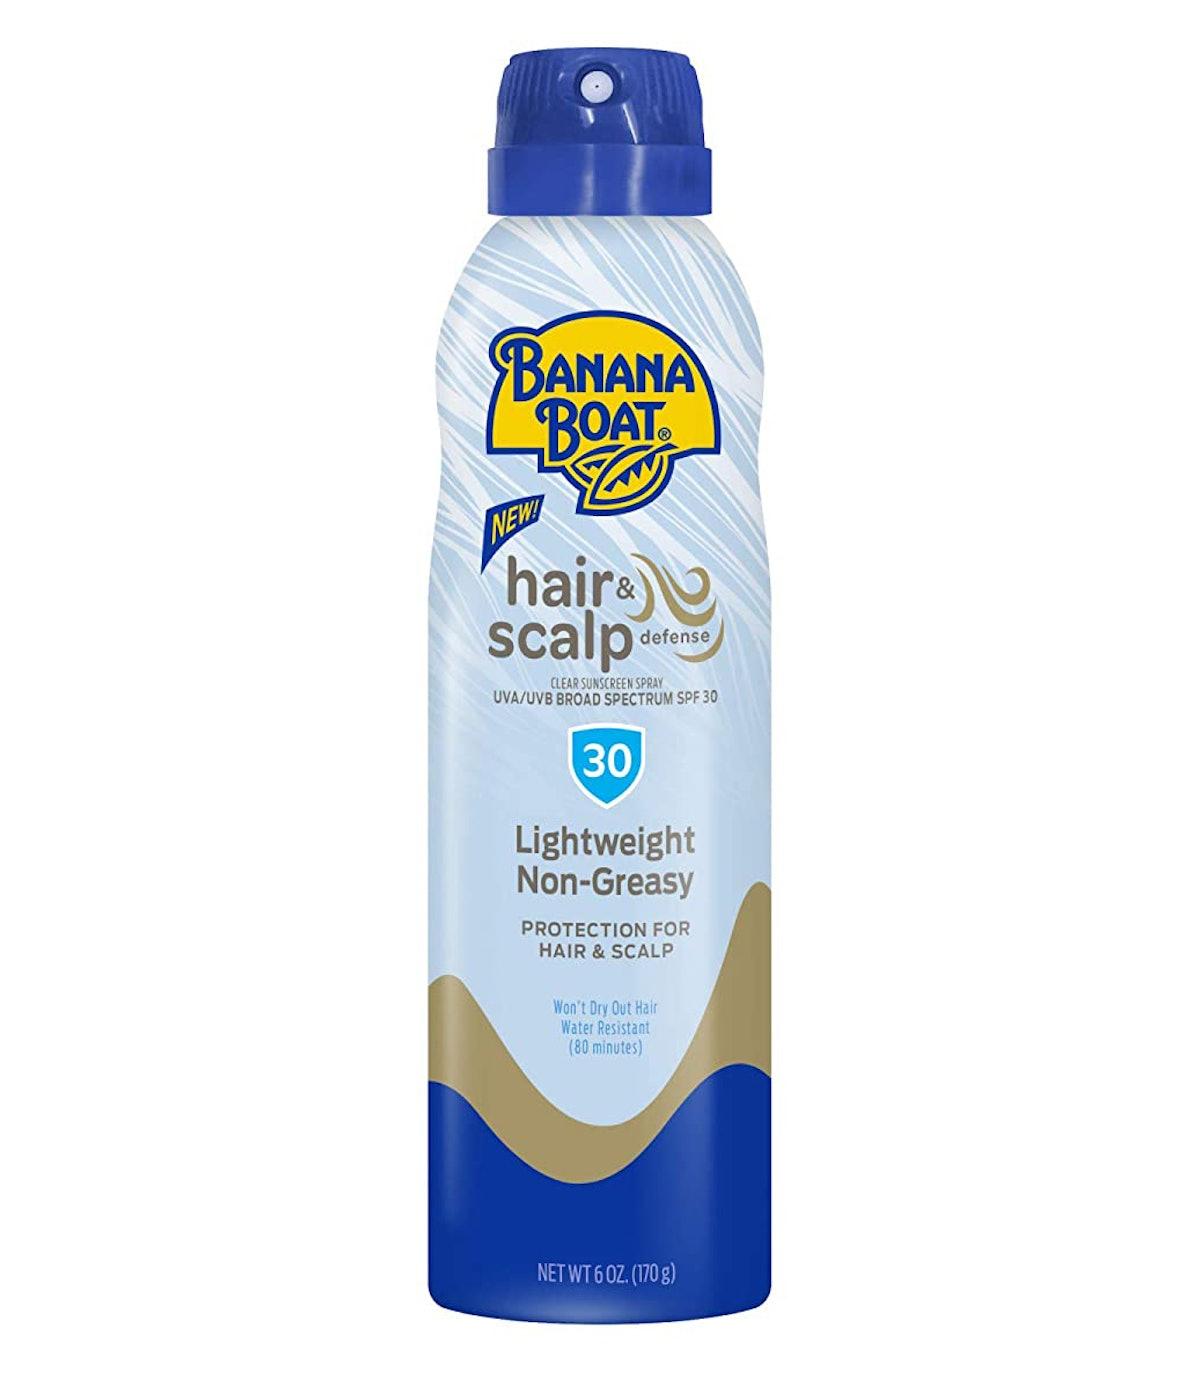 Banana Boat Hair & Scalp Defense Sunscreen Spray